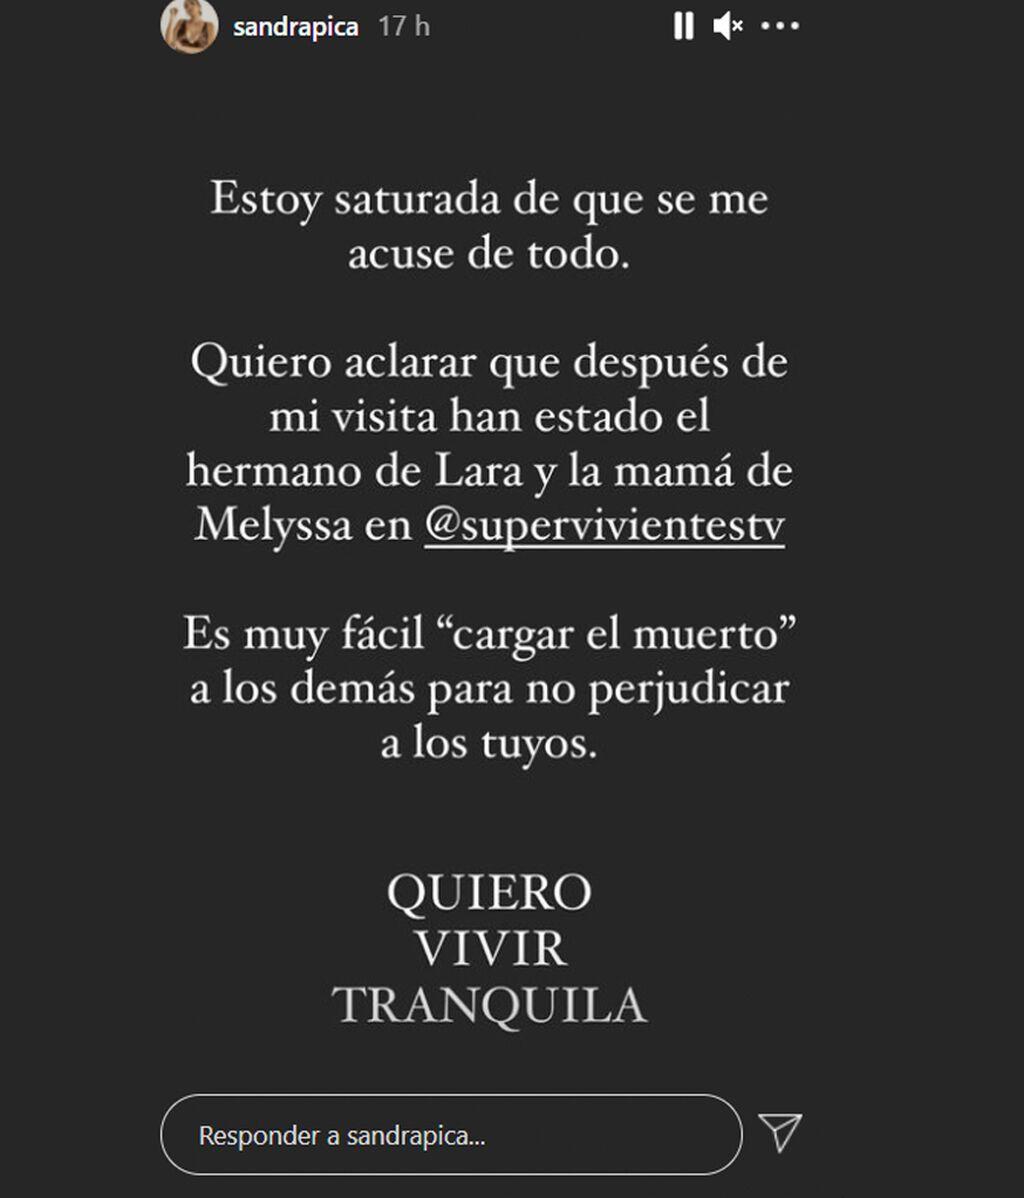 La respuesta de Sandra Pica / @sandrapica